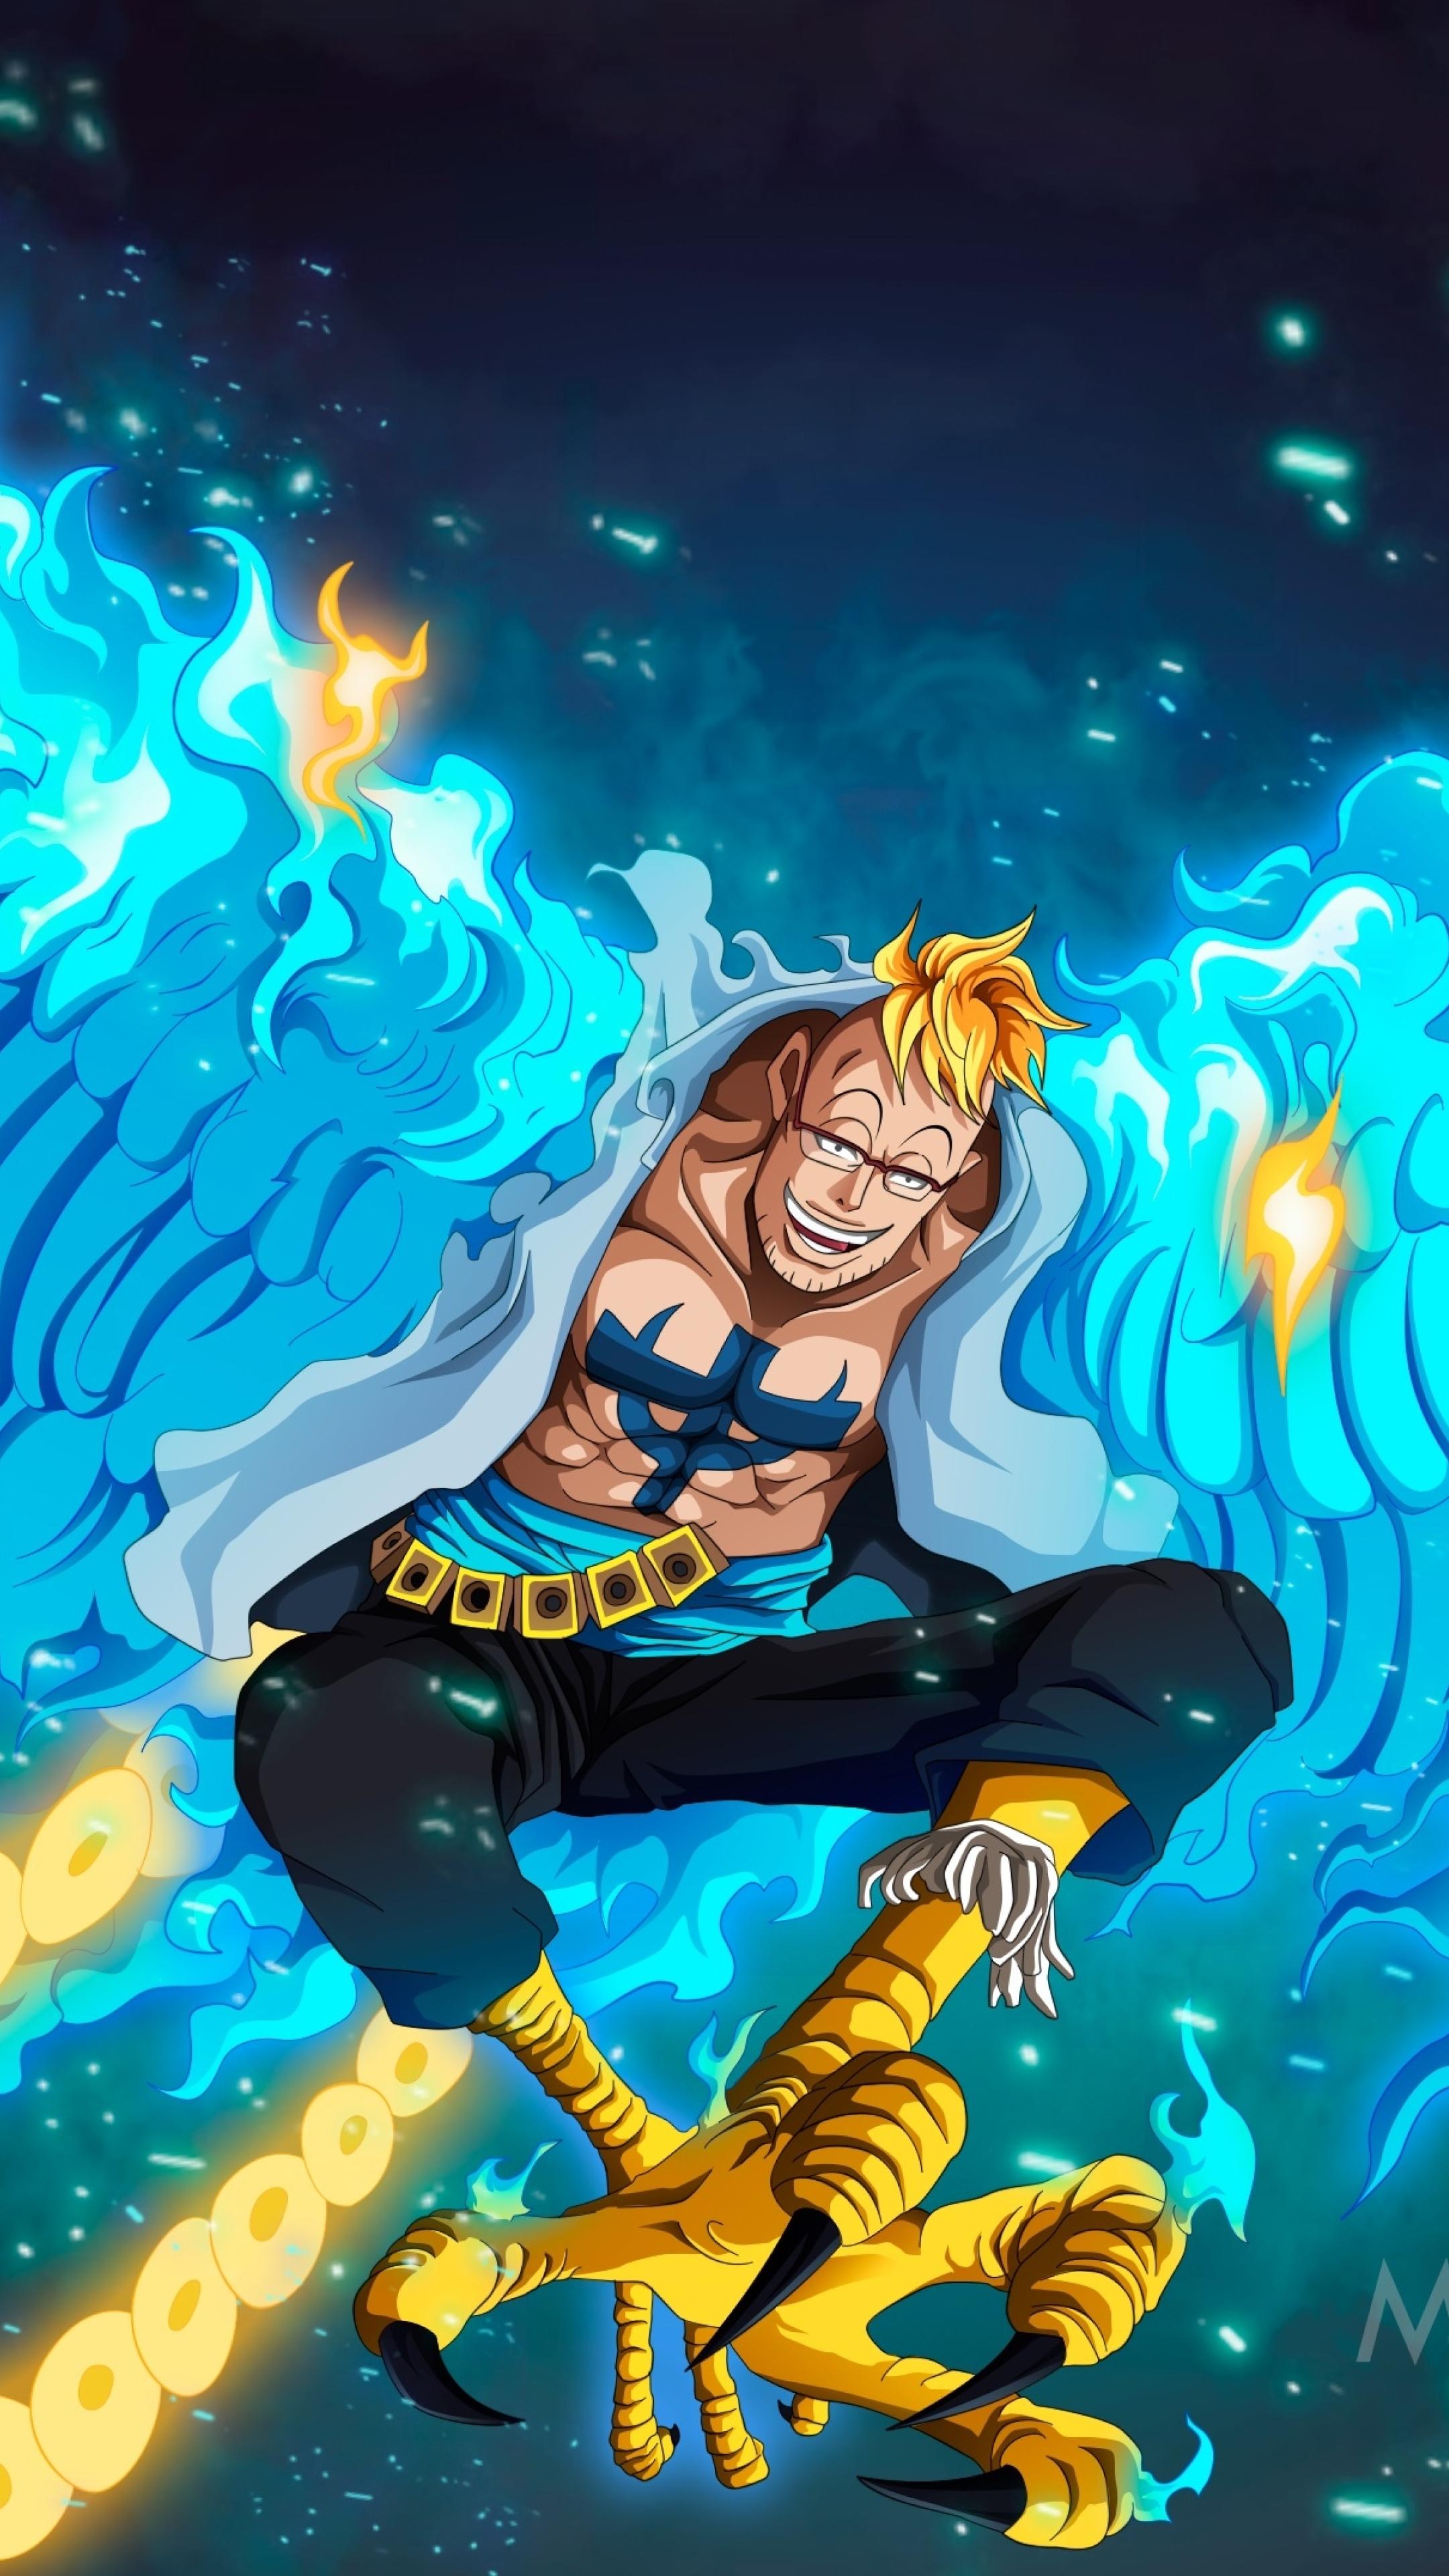 Anime Wallpaper Hd Download Wallpaper One Piece Terbaru